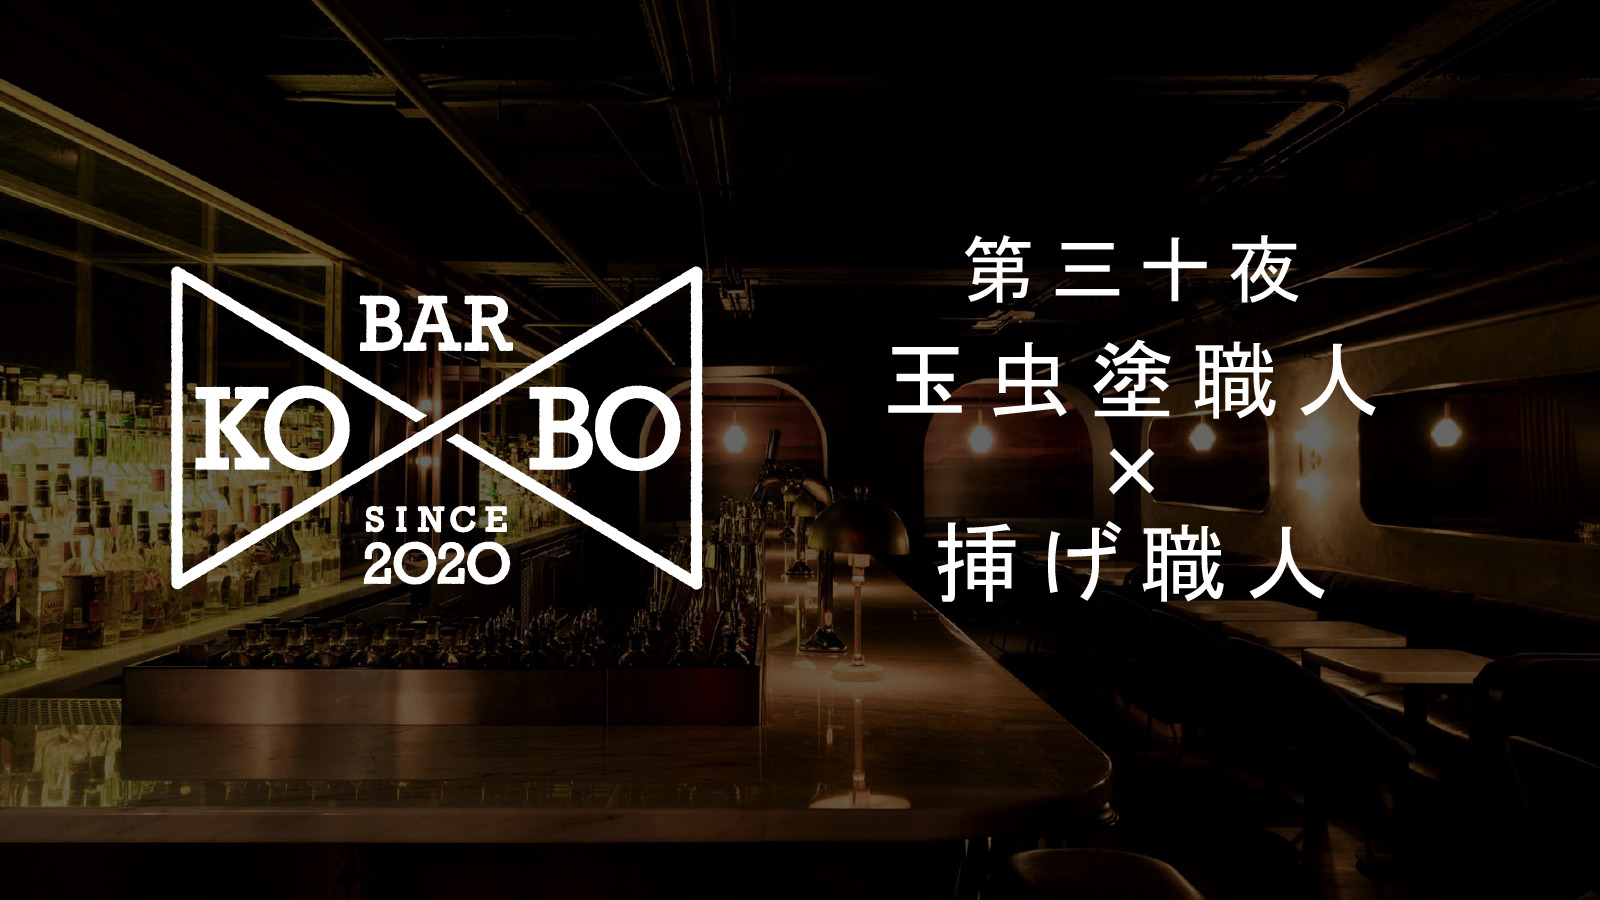 【Bar KO-BO 第三十夜】玉虫塗職人×挿げ職人